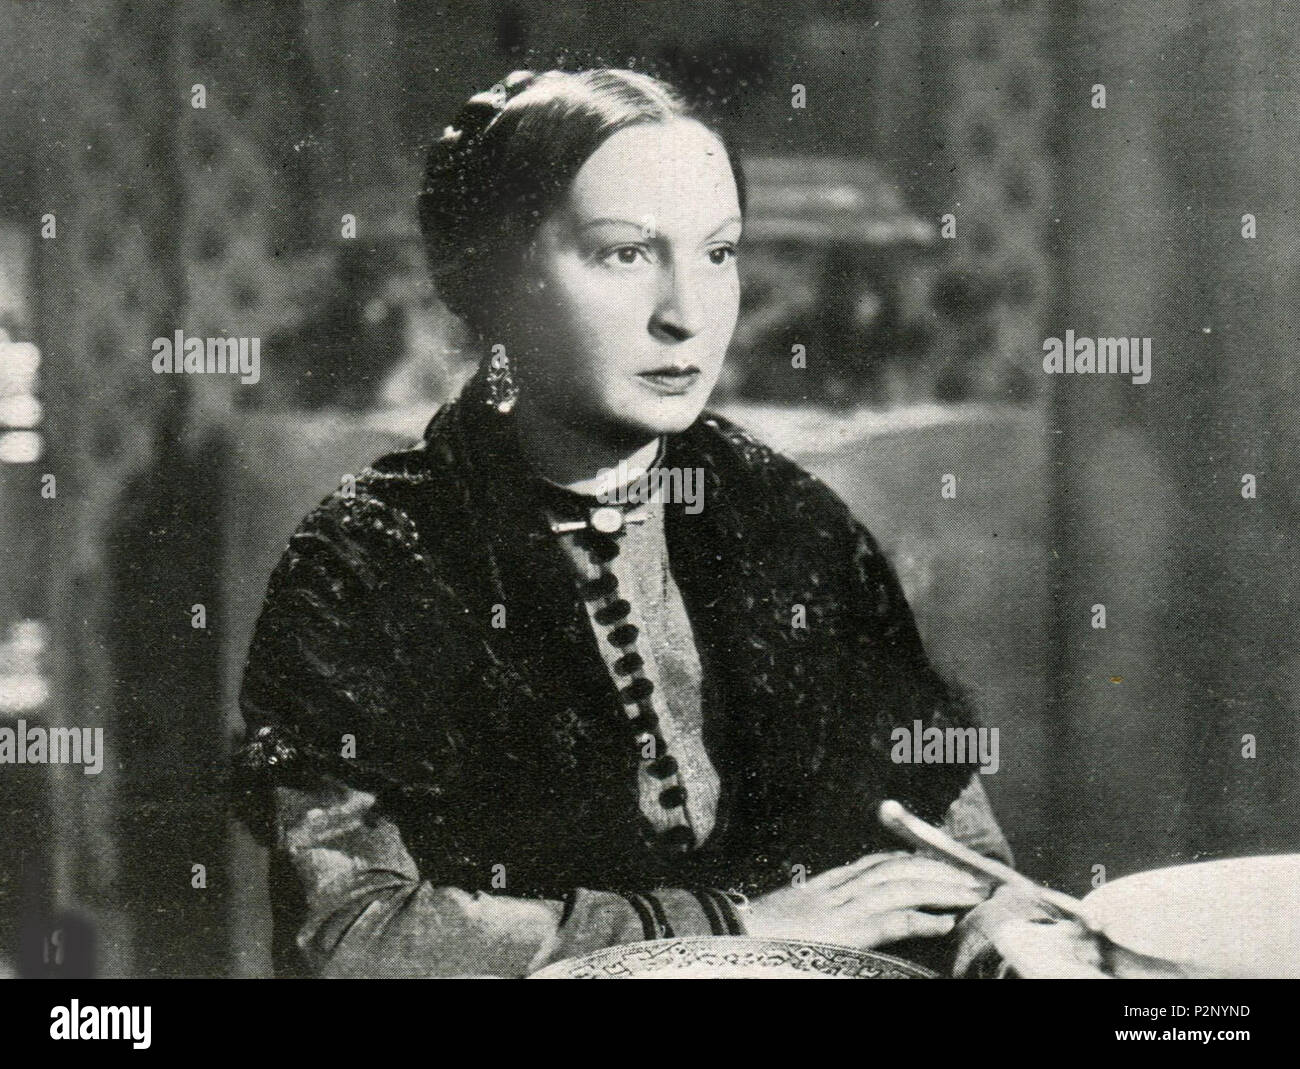 Catalina (actress) pictures